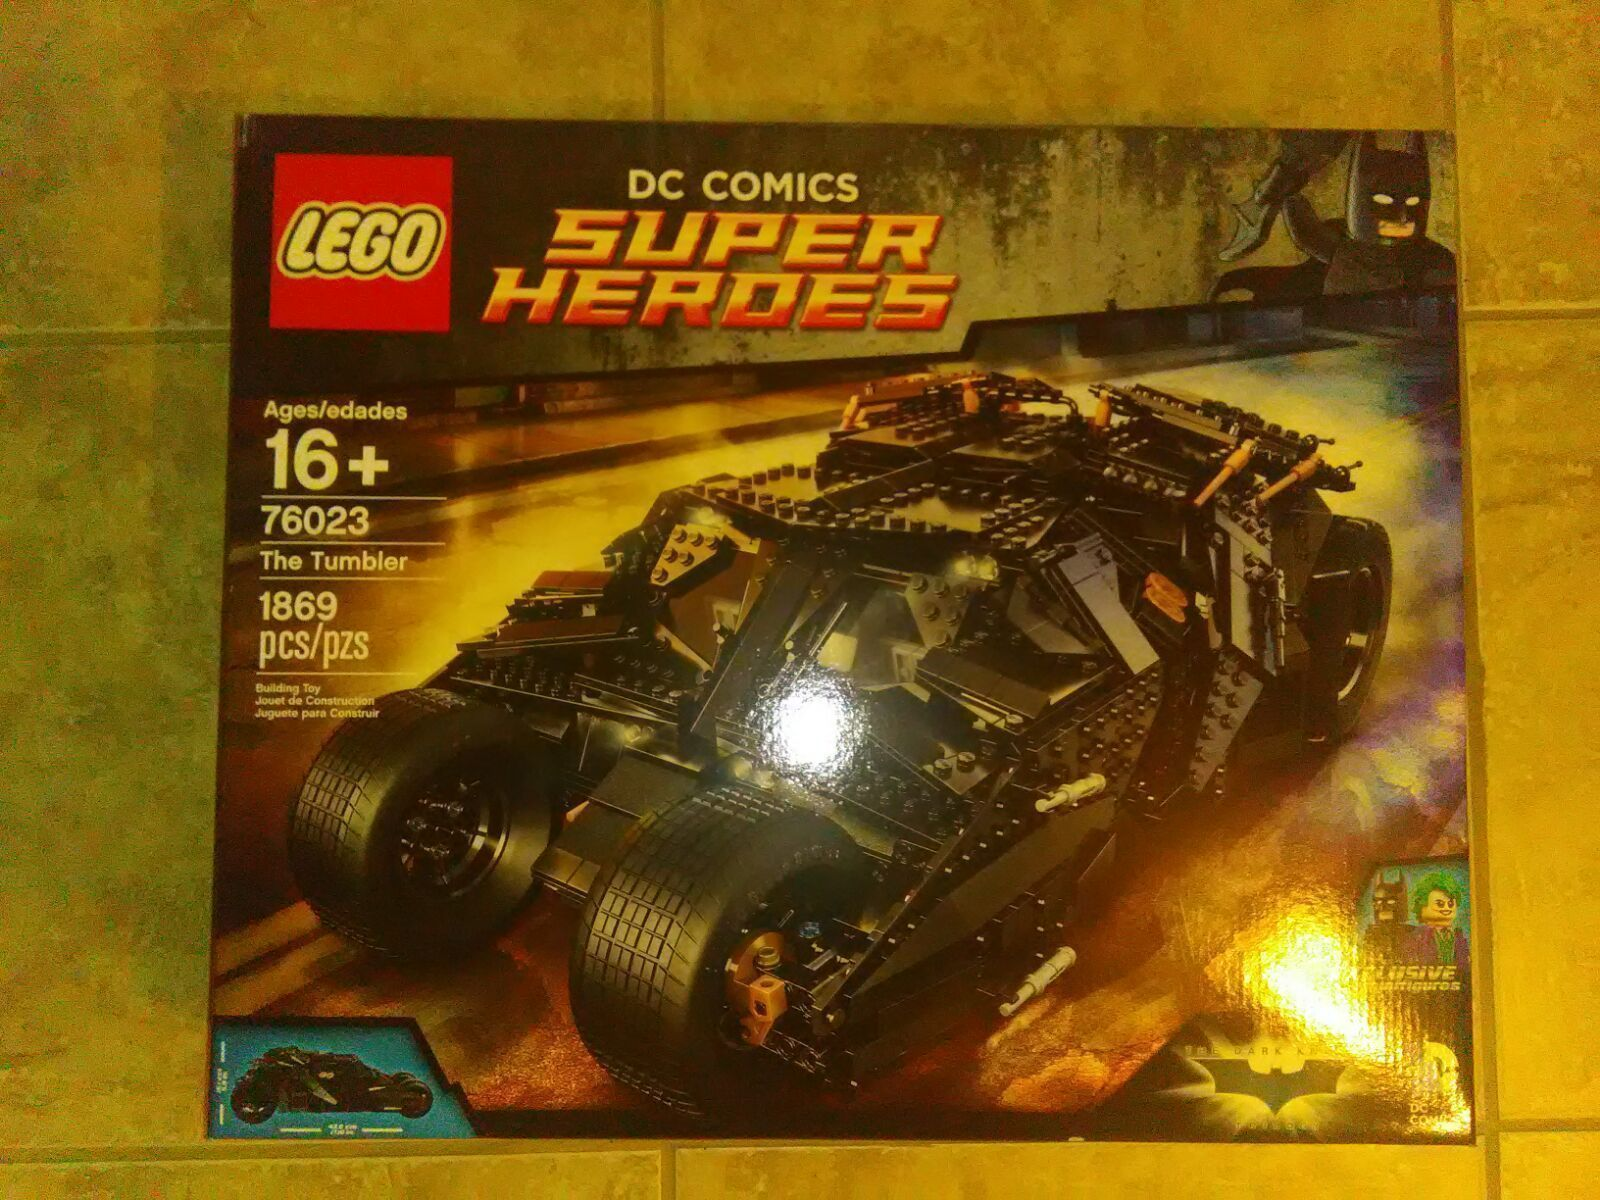 Brand new Batman Tumbler Lego Set #76023